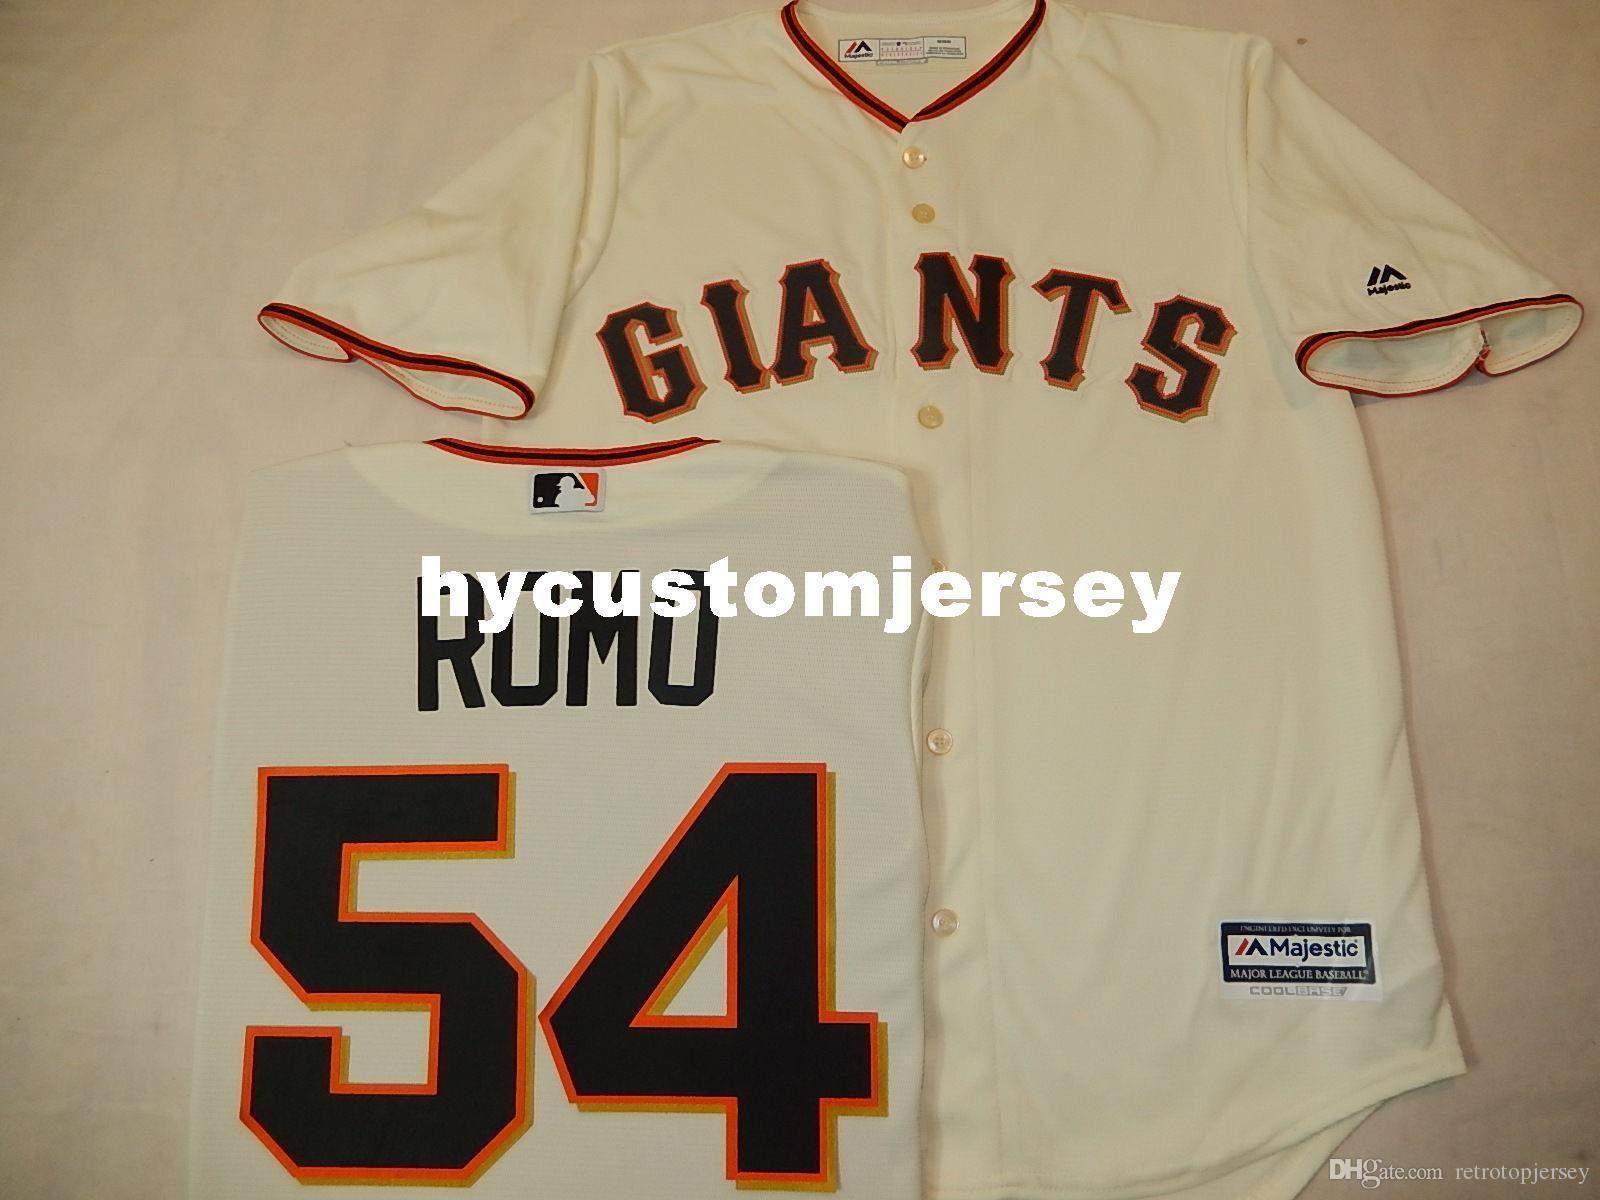 Pas cher sur mesure MENS MAJESTIC # 54 Sergio Romo Baseball JERSEY Mens maillots piquées CREME Big and Tall TAILLE XS-6XL à vendre